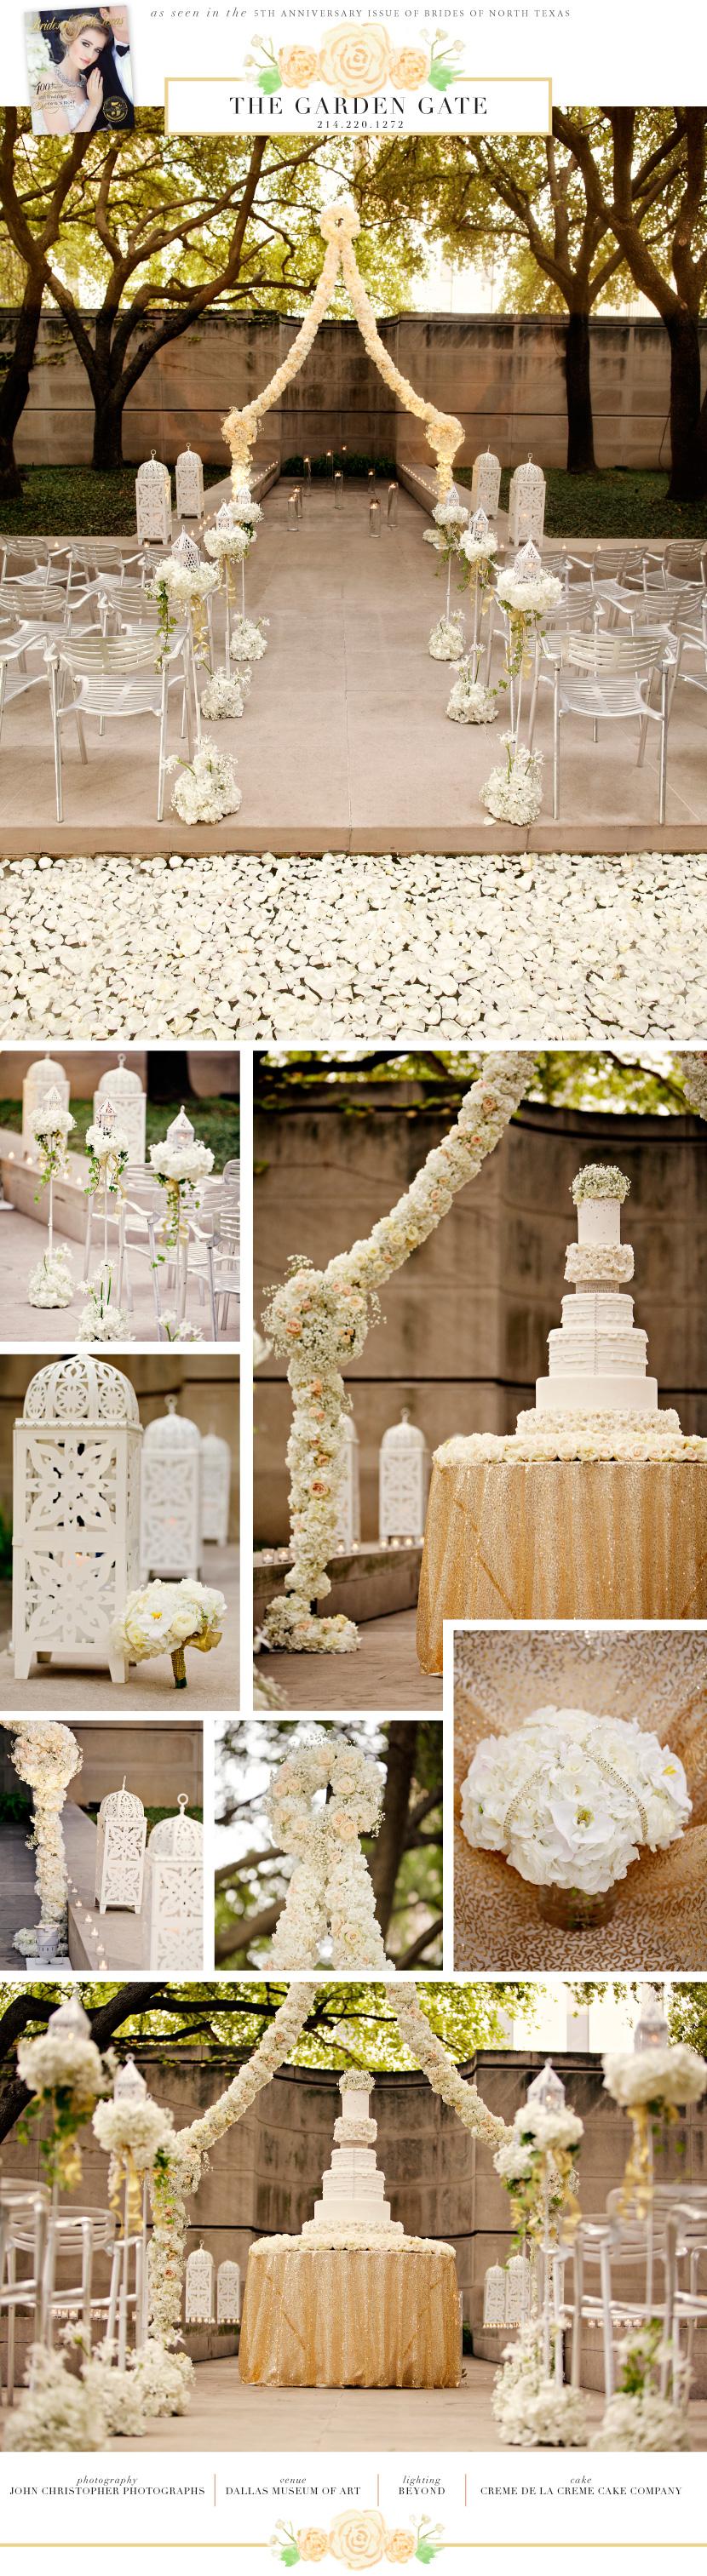 Beyond the Bouquet | The Garden Gate | Brides of North ...